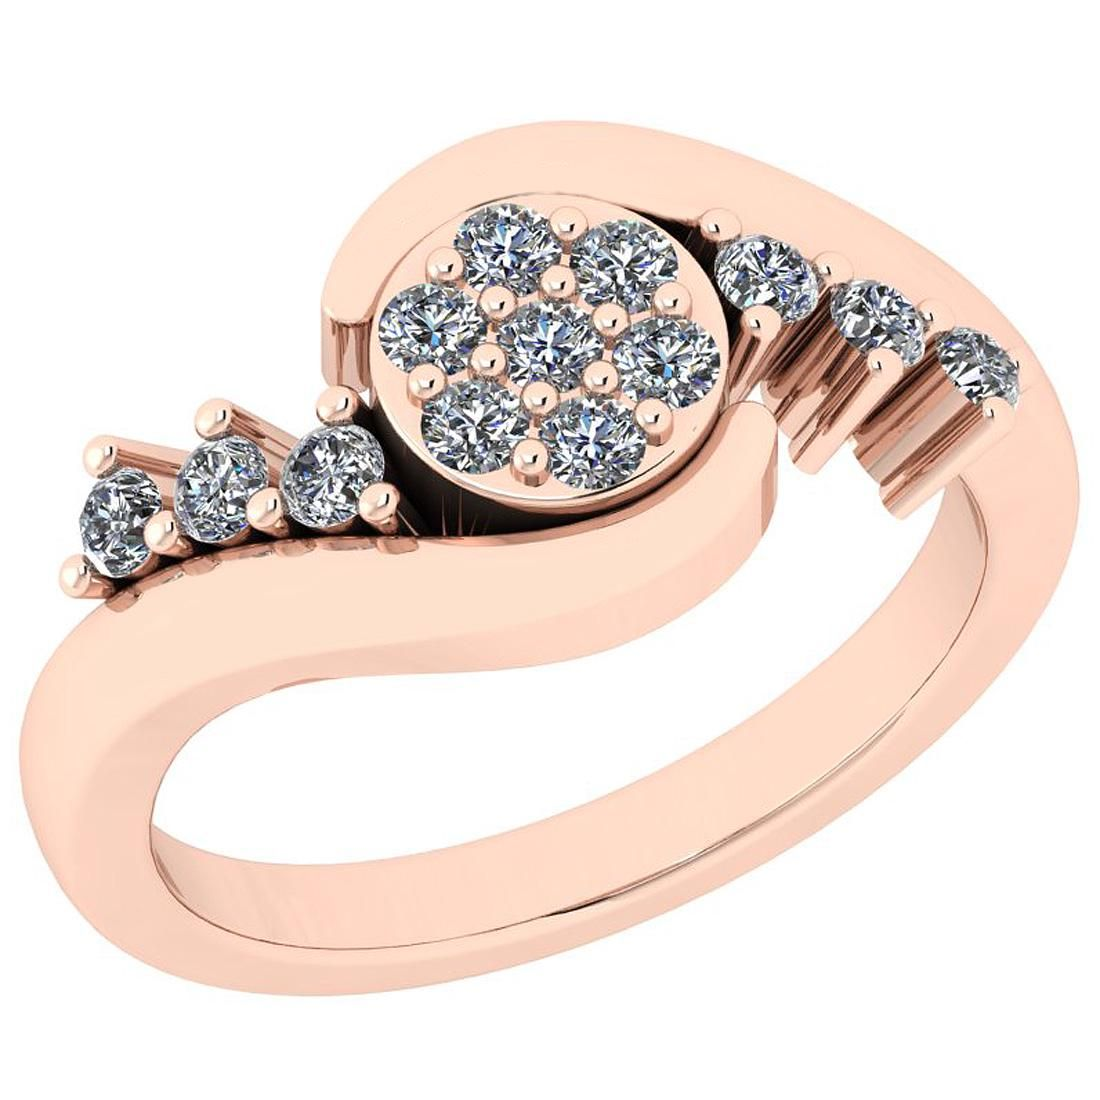 Certified 0.50 Ctw Diamond SI2/I1 14K Rose Gold Ring